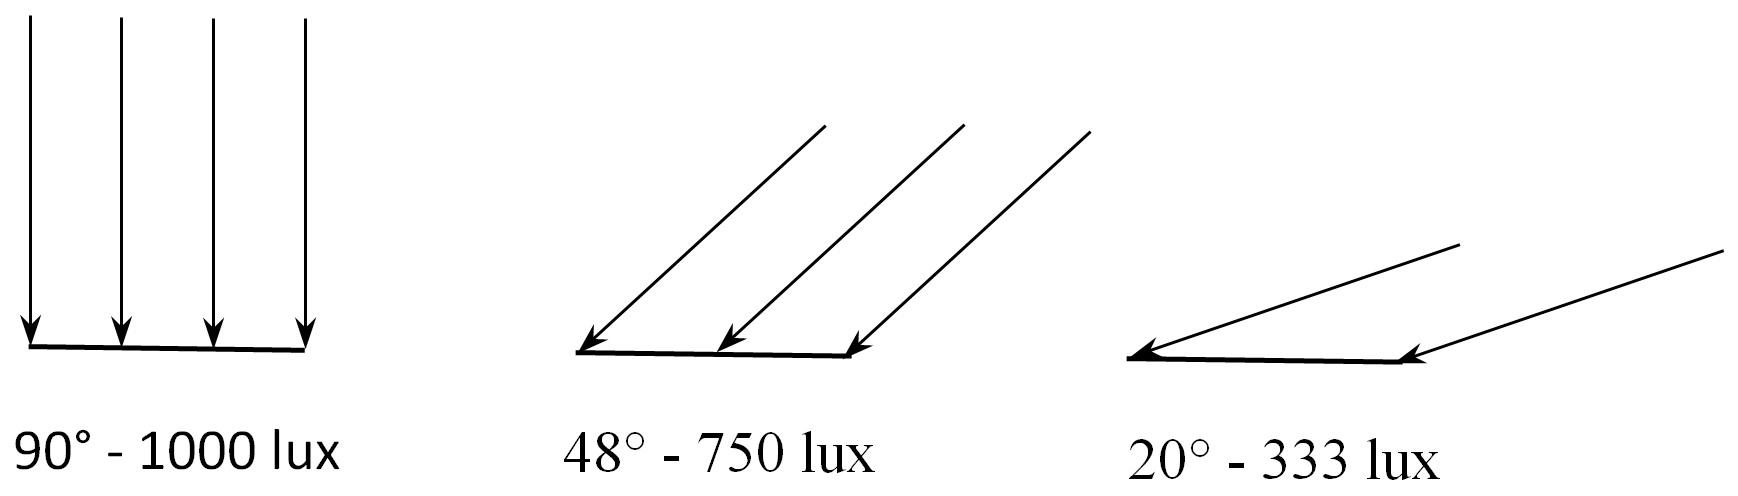 FIG. 5 – Illuminance of surface depends on angle of illumination